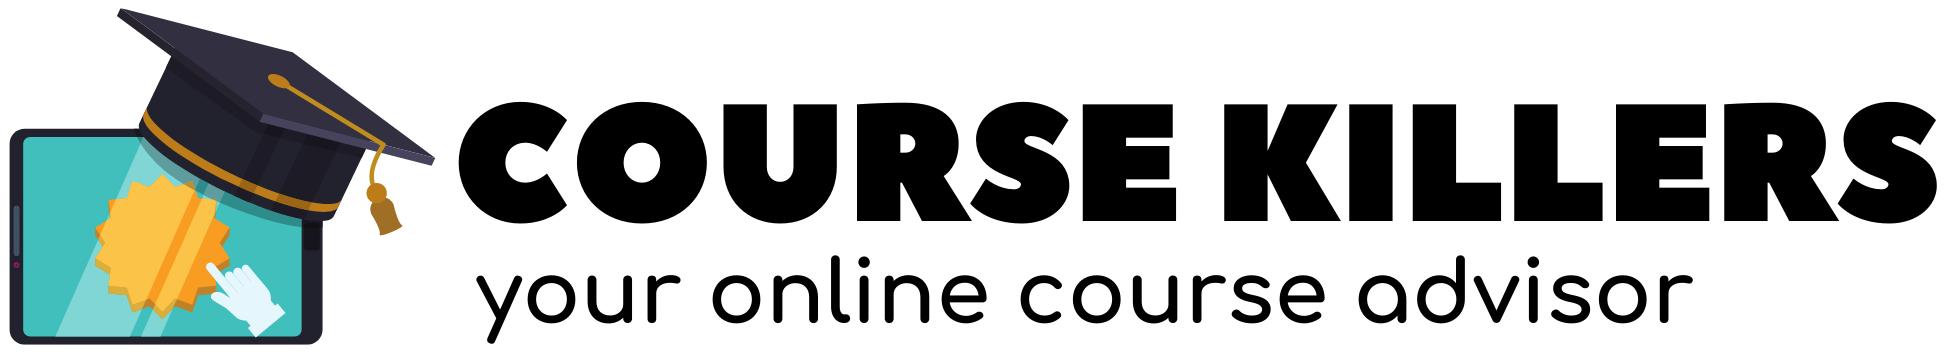 coursekillers.com